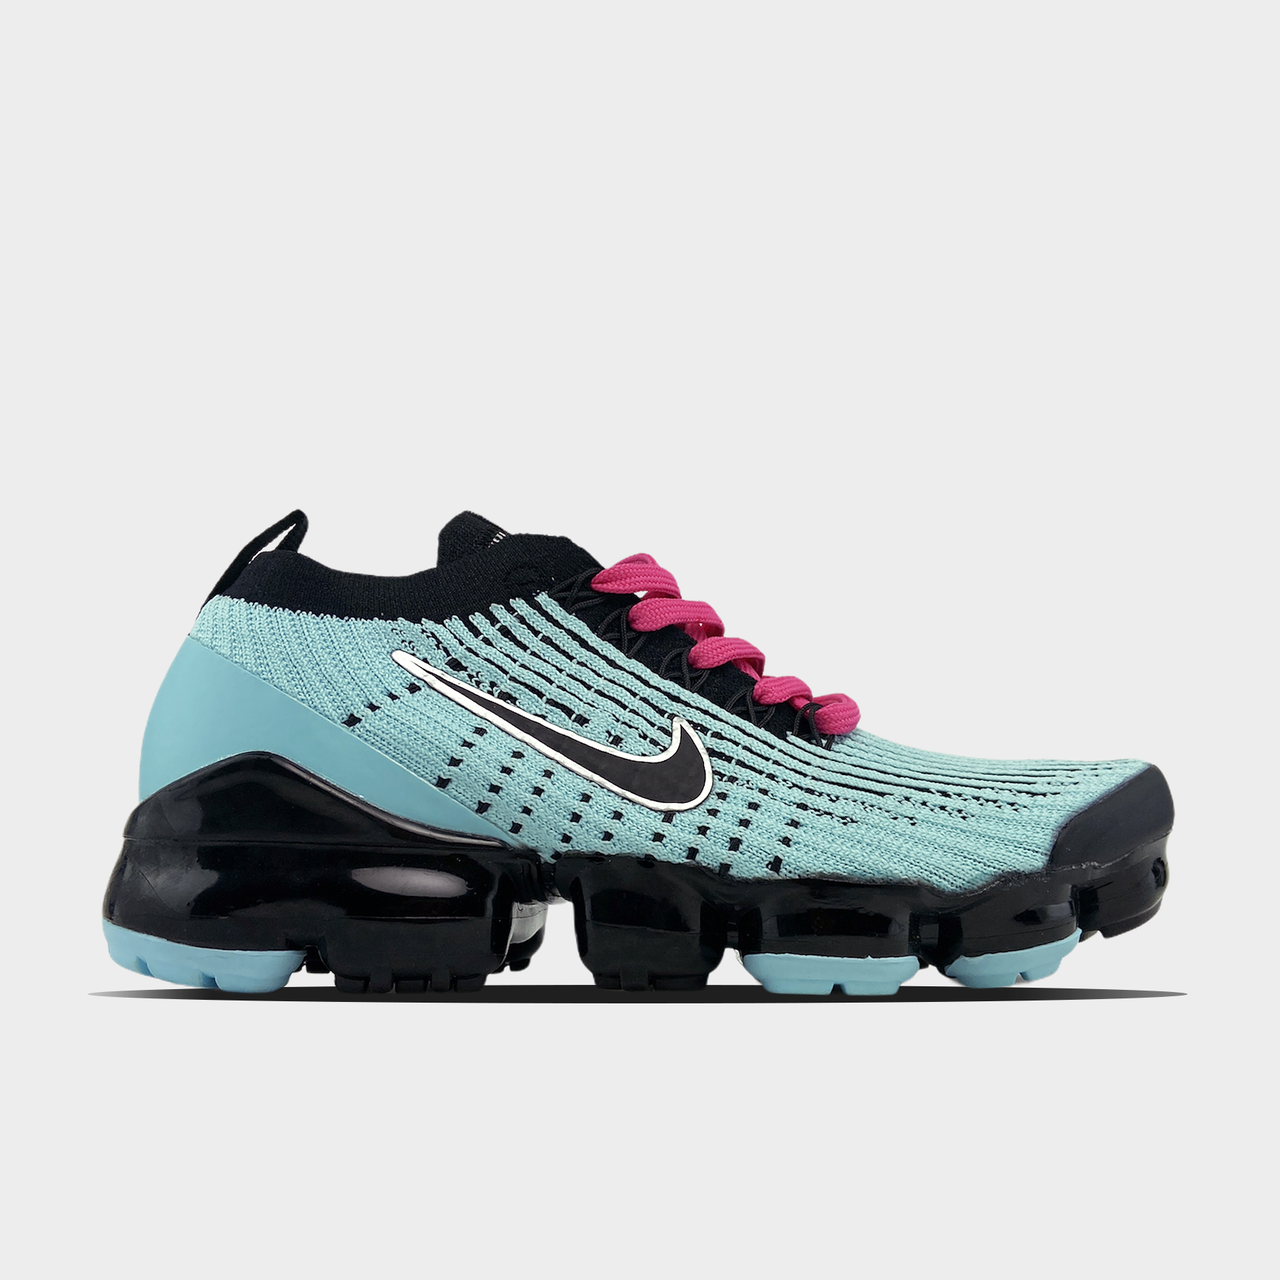 Nk, крос, обувь, взуття, sneakers, шузы, Air VaporMax Flyknit 3.0 South Beach (Бирюзовый)